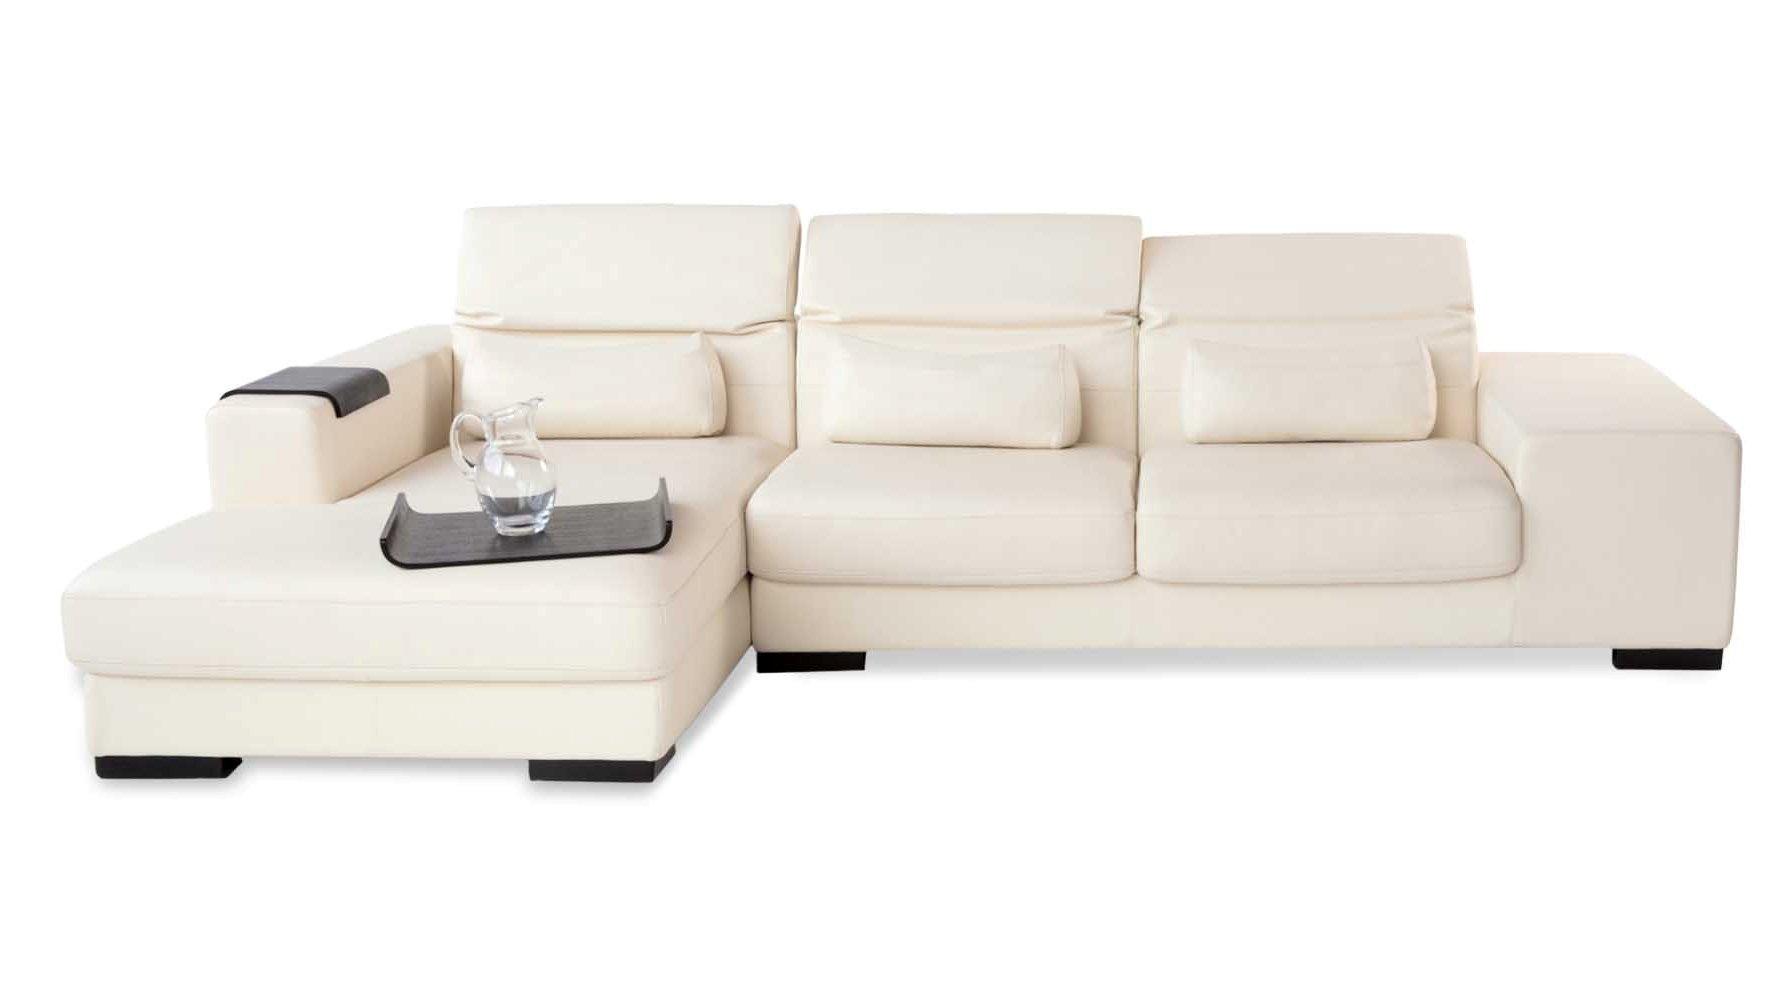 White Dublin Sectional Sofa With Ottoman Zuri Furniture